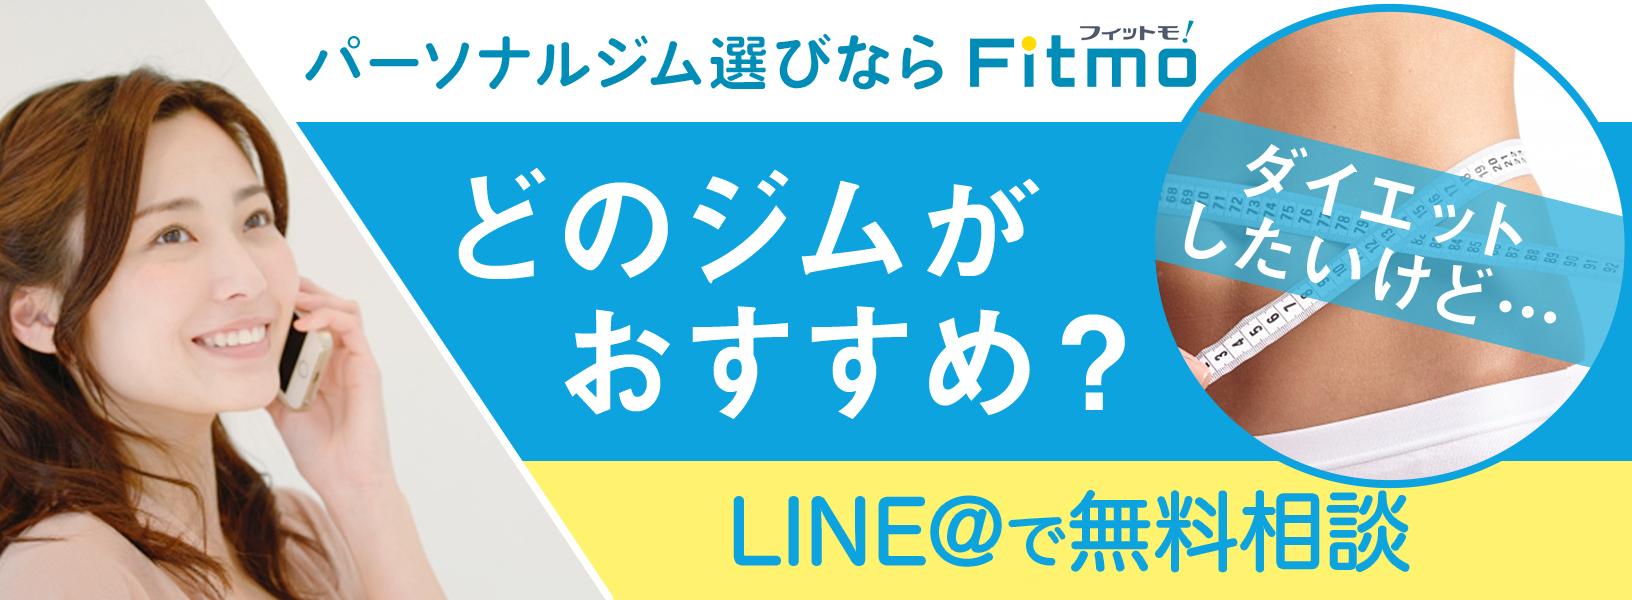 Line banner fitmo